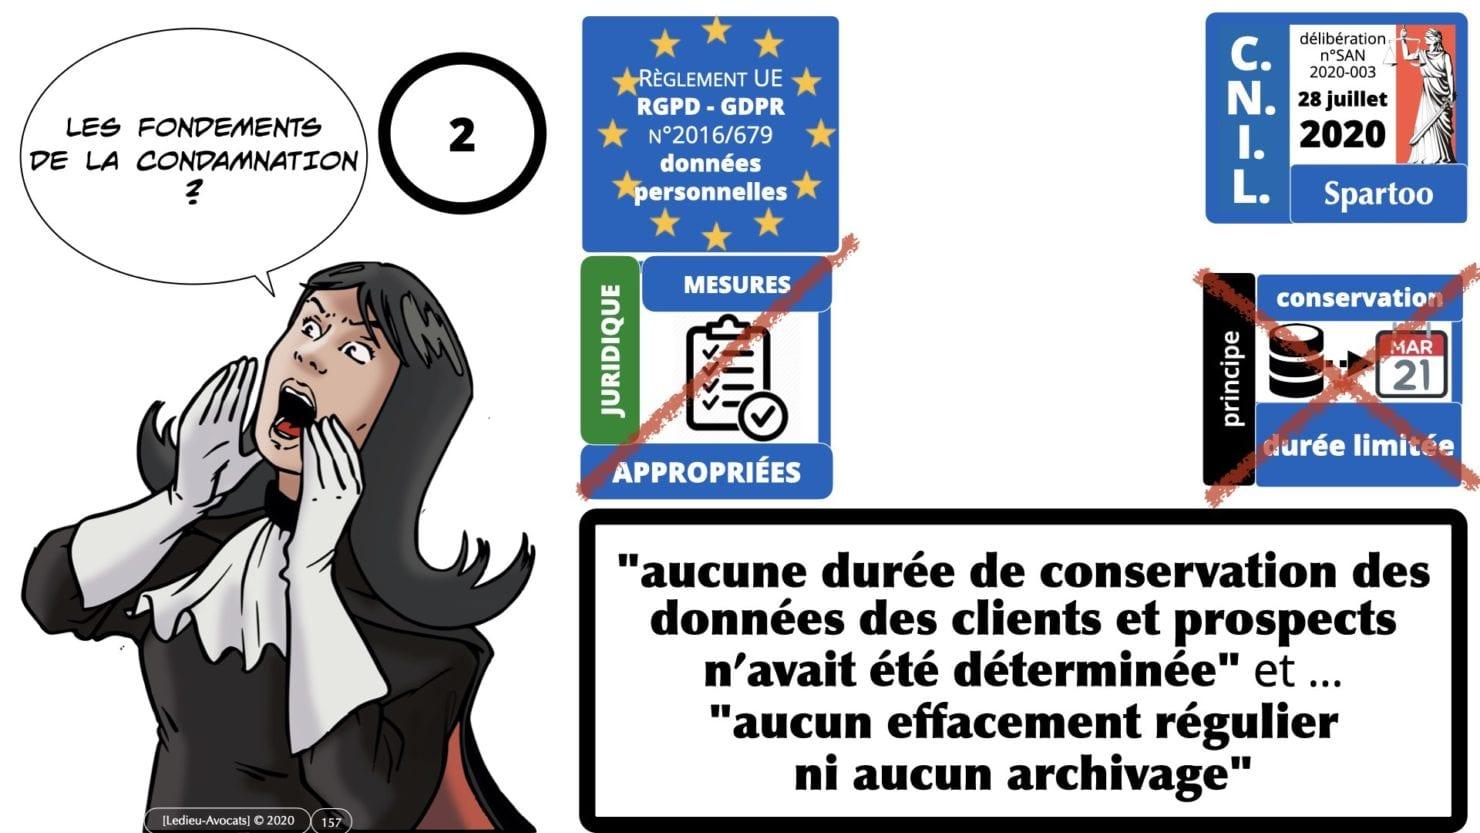 RGPD e-Privacy principes actualité jurisprudence ©Ledieu-Avocats 25-06-2021.157